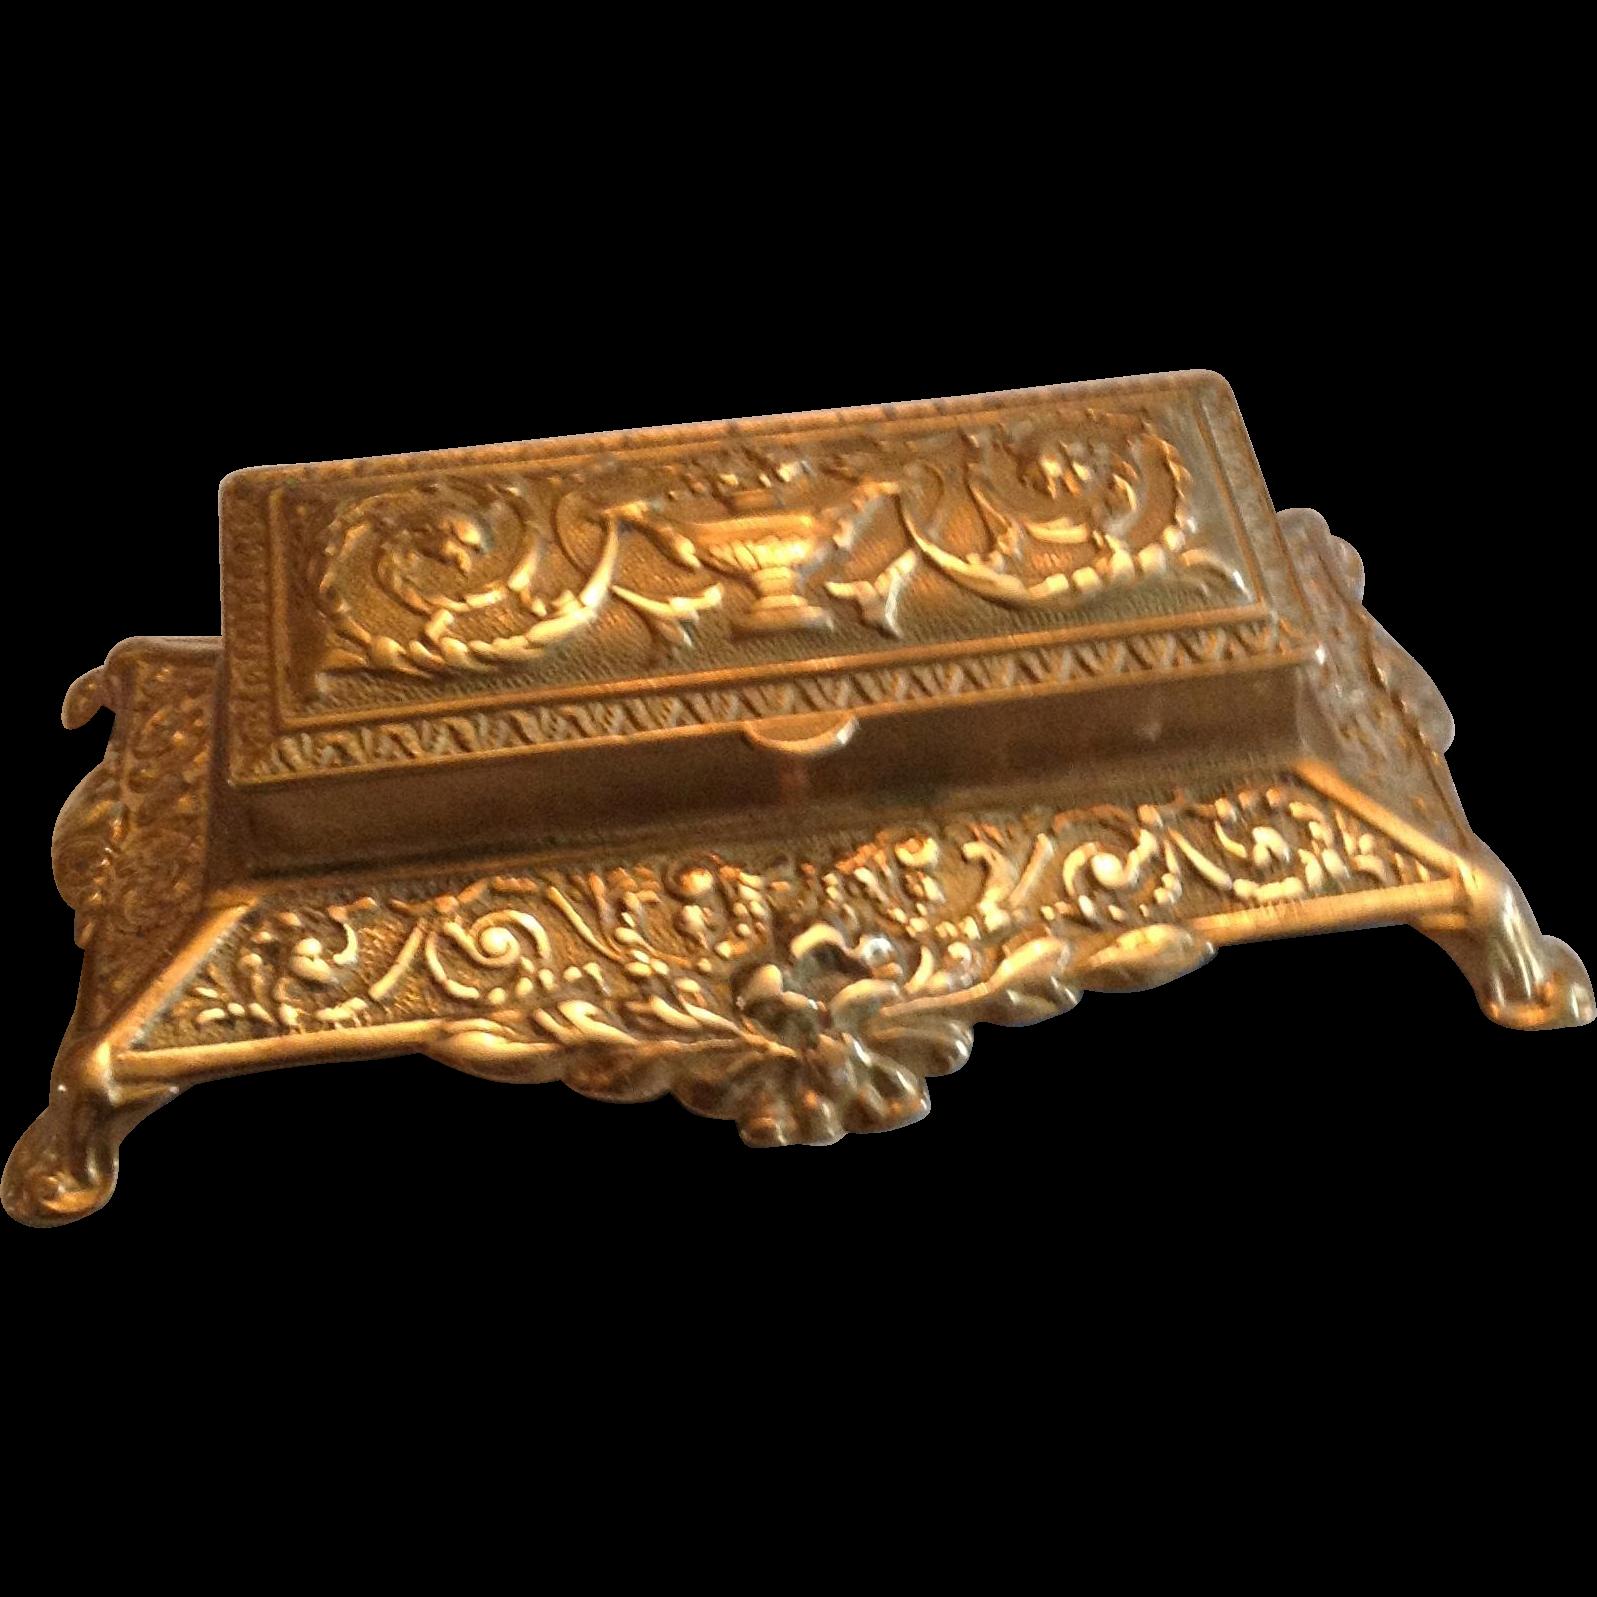 19th Century Decorative Brass Three Section Stamp Holder